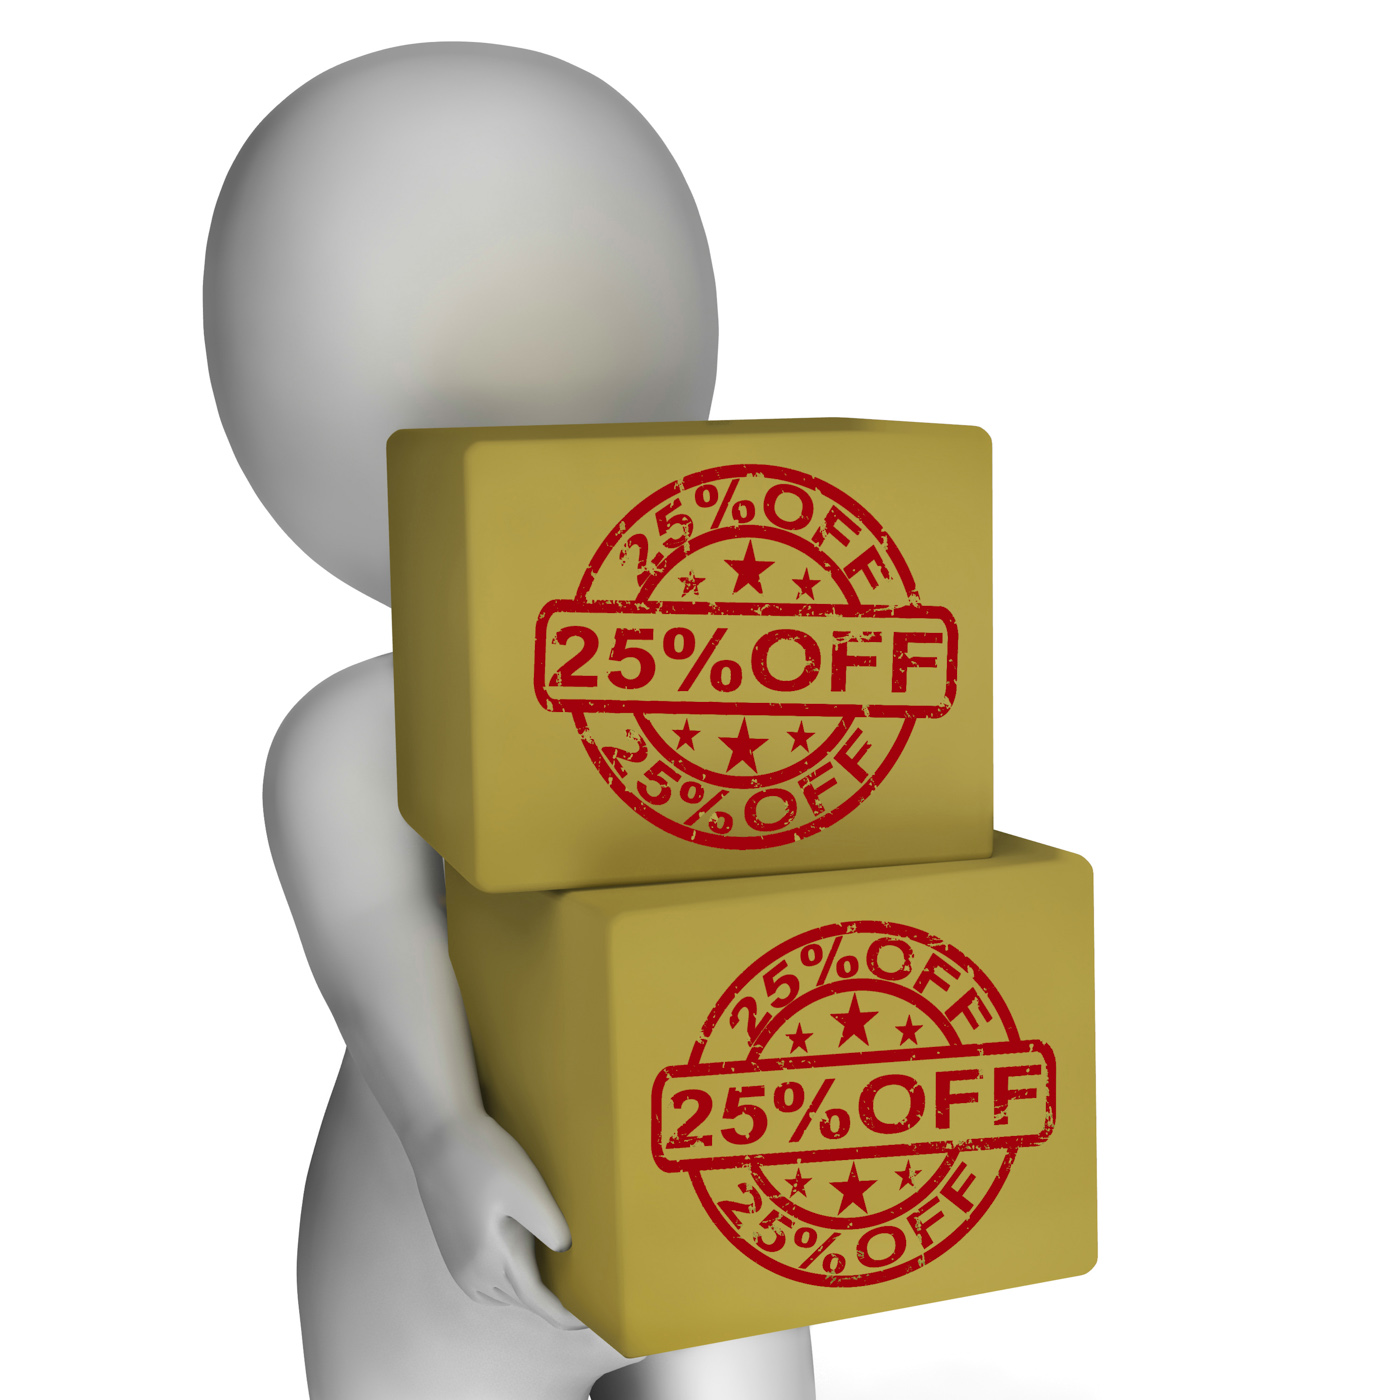 Twenty five percent off boxes show 25 price markdown photo